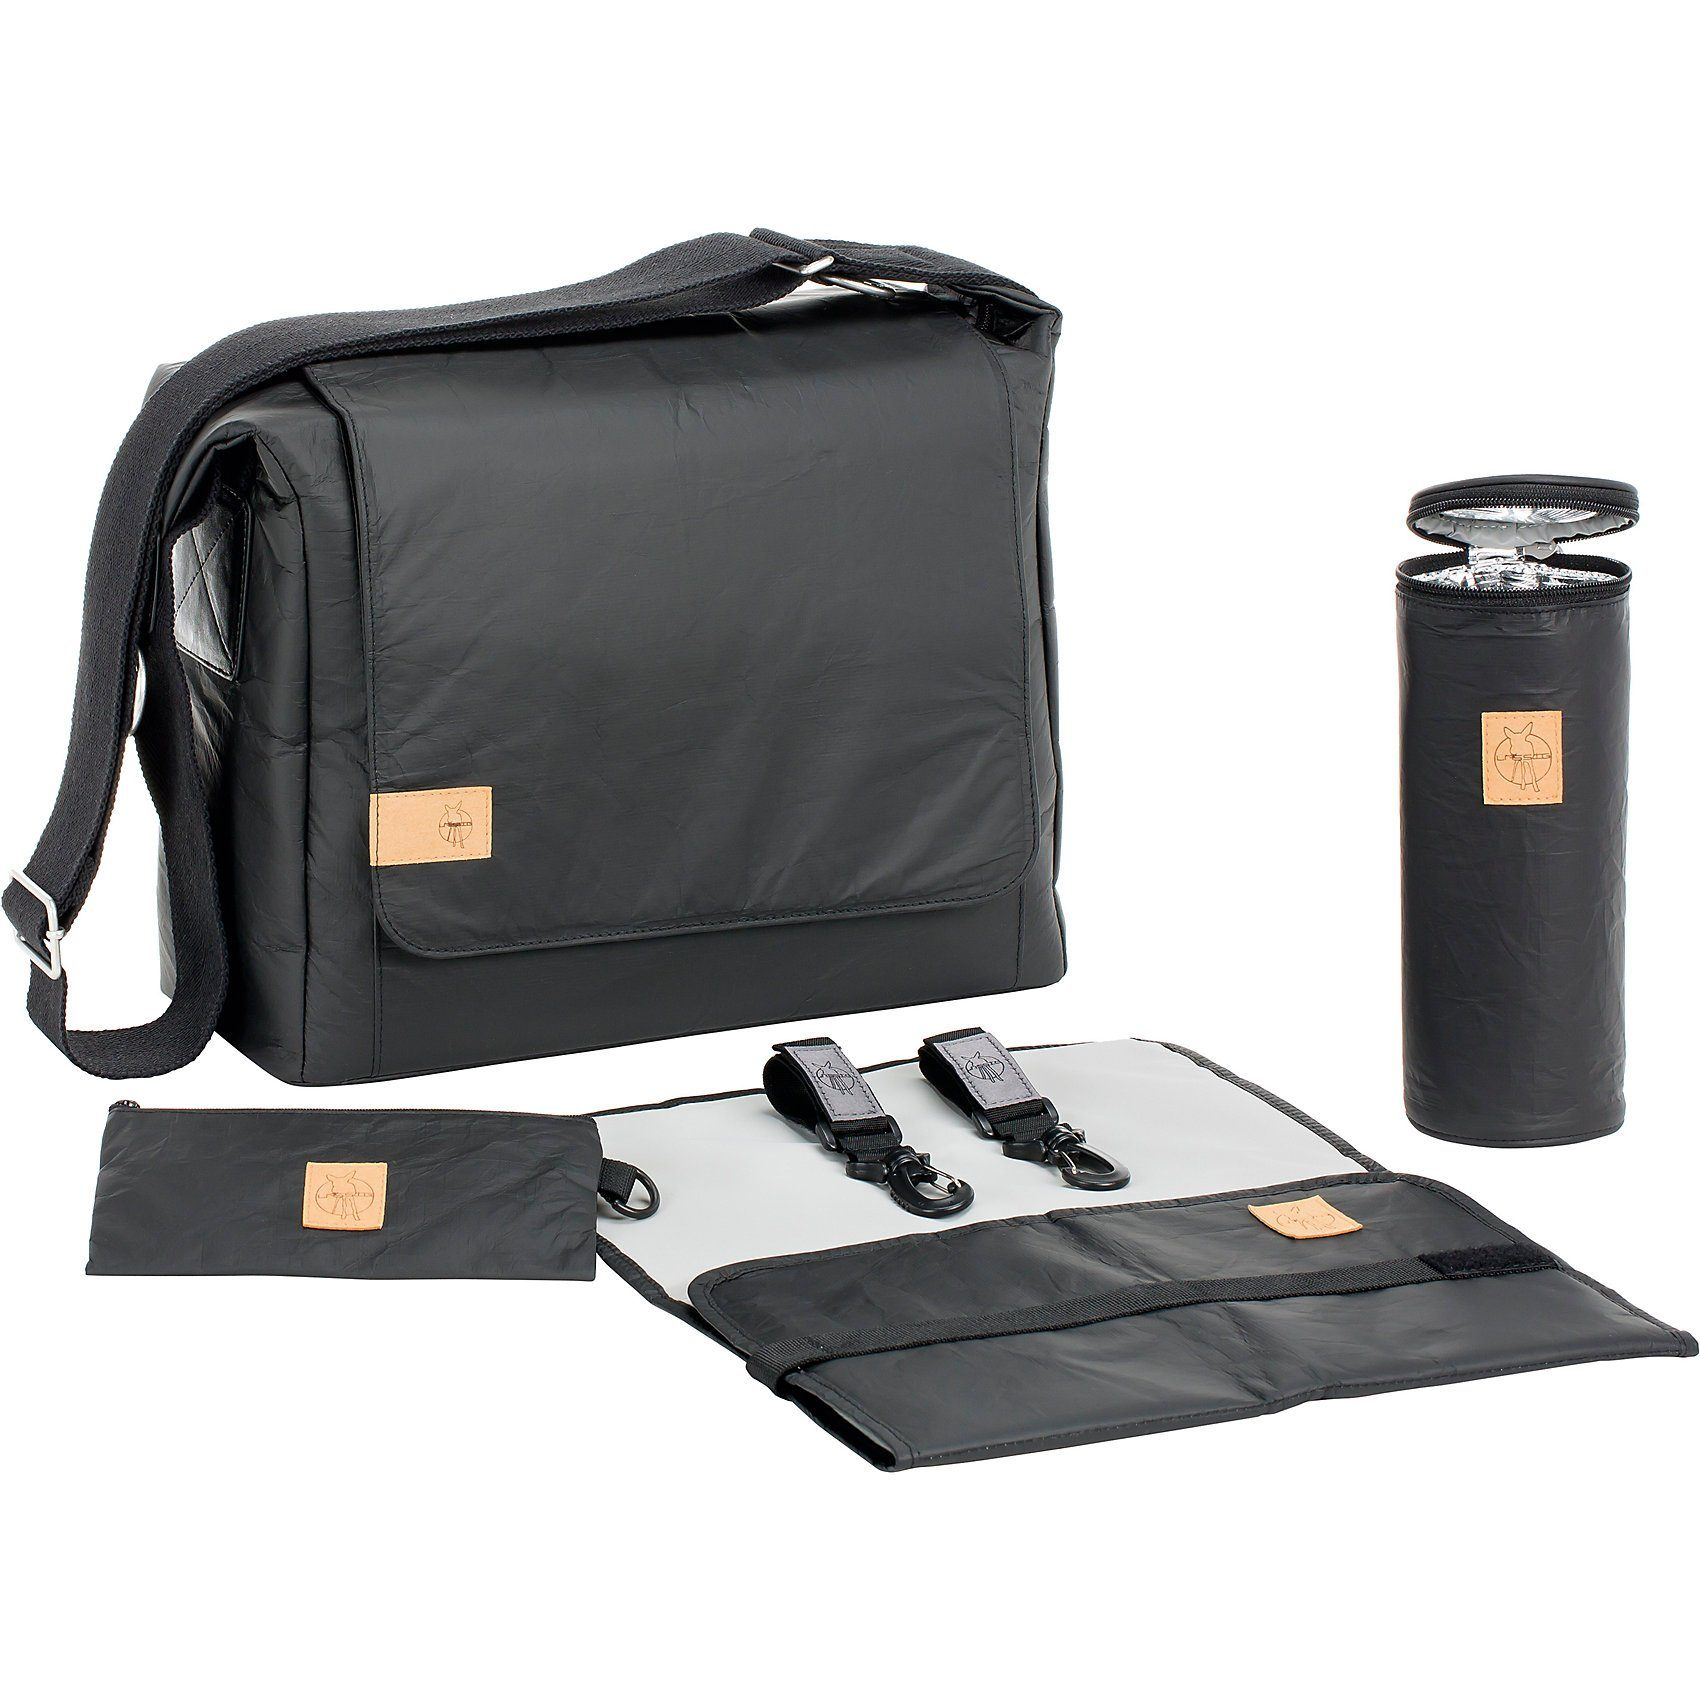 Lässig Wickeltasche Messenger Bag Tyve, Greenlabel, black